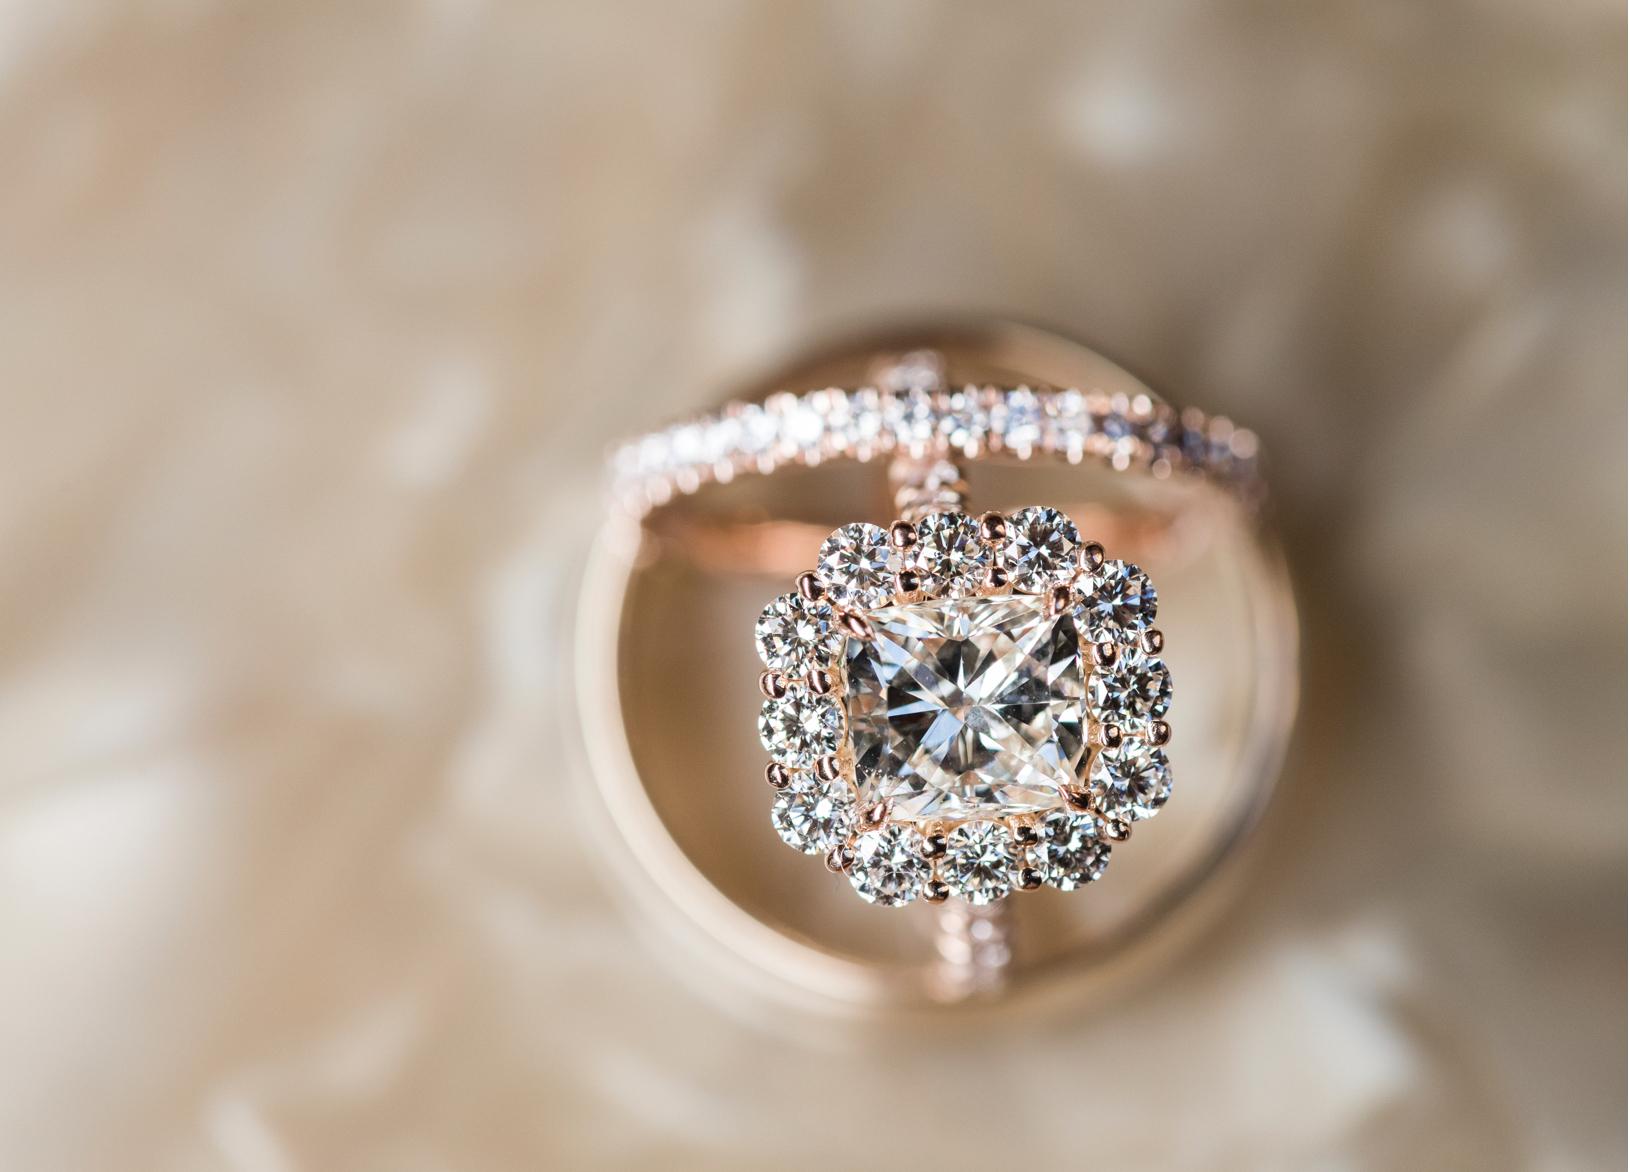 Wedding rings - Aislinn Kate Wedding Photography - Pensacola, Florida